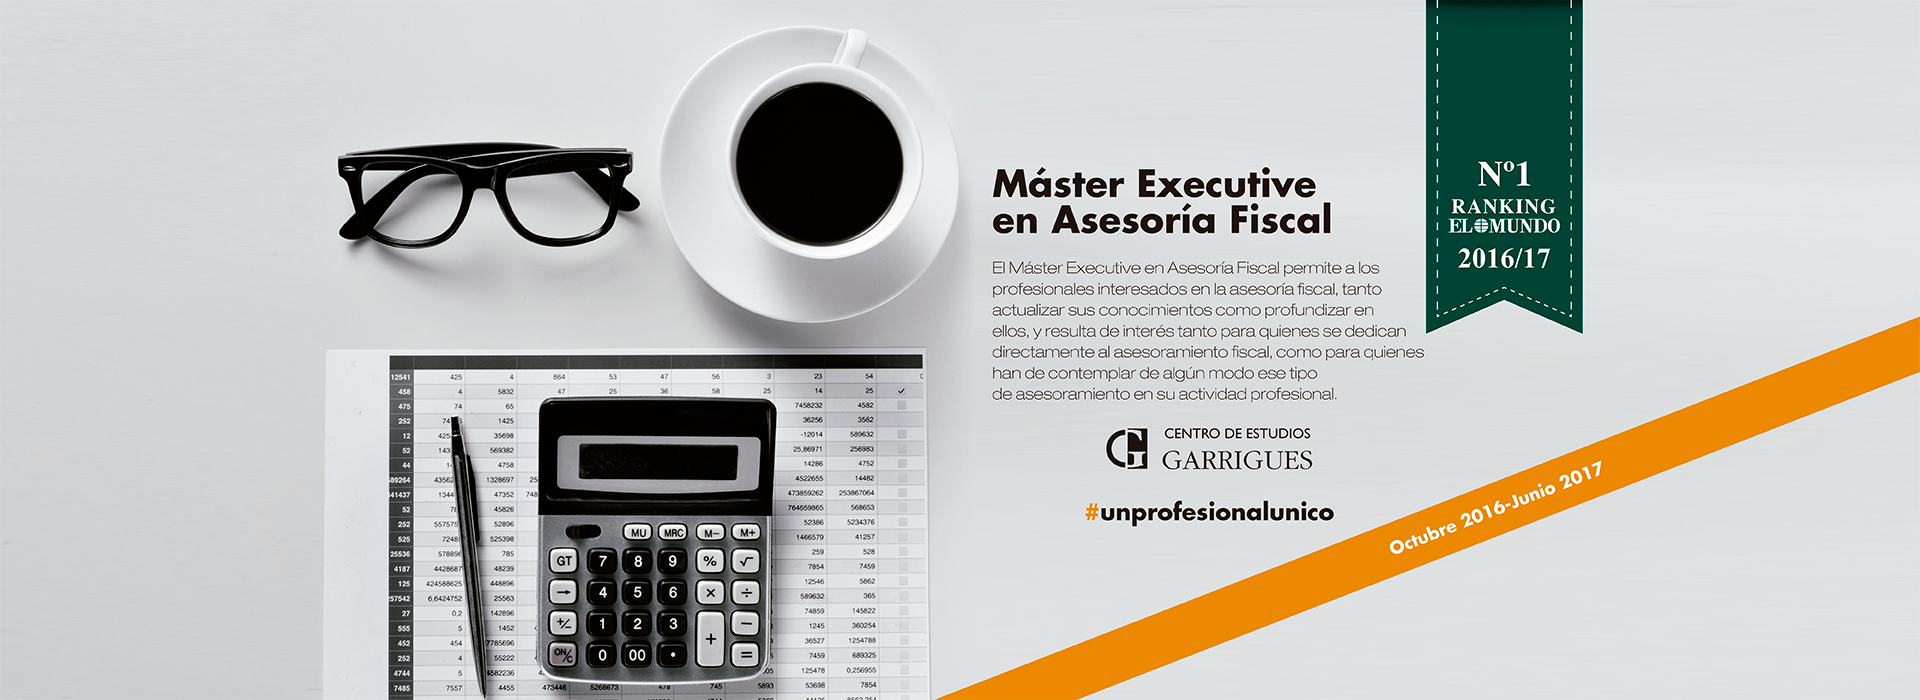 CEG_Slide_2016_AsesoriaFiscal